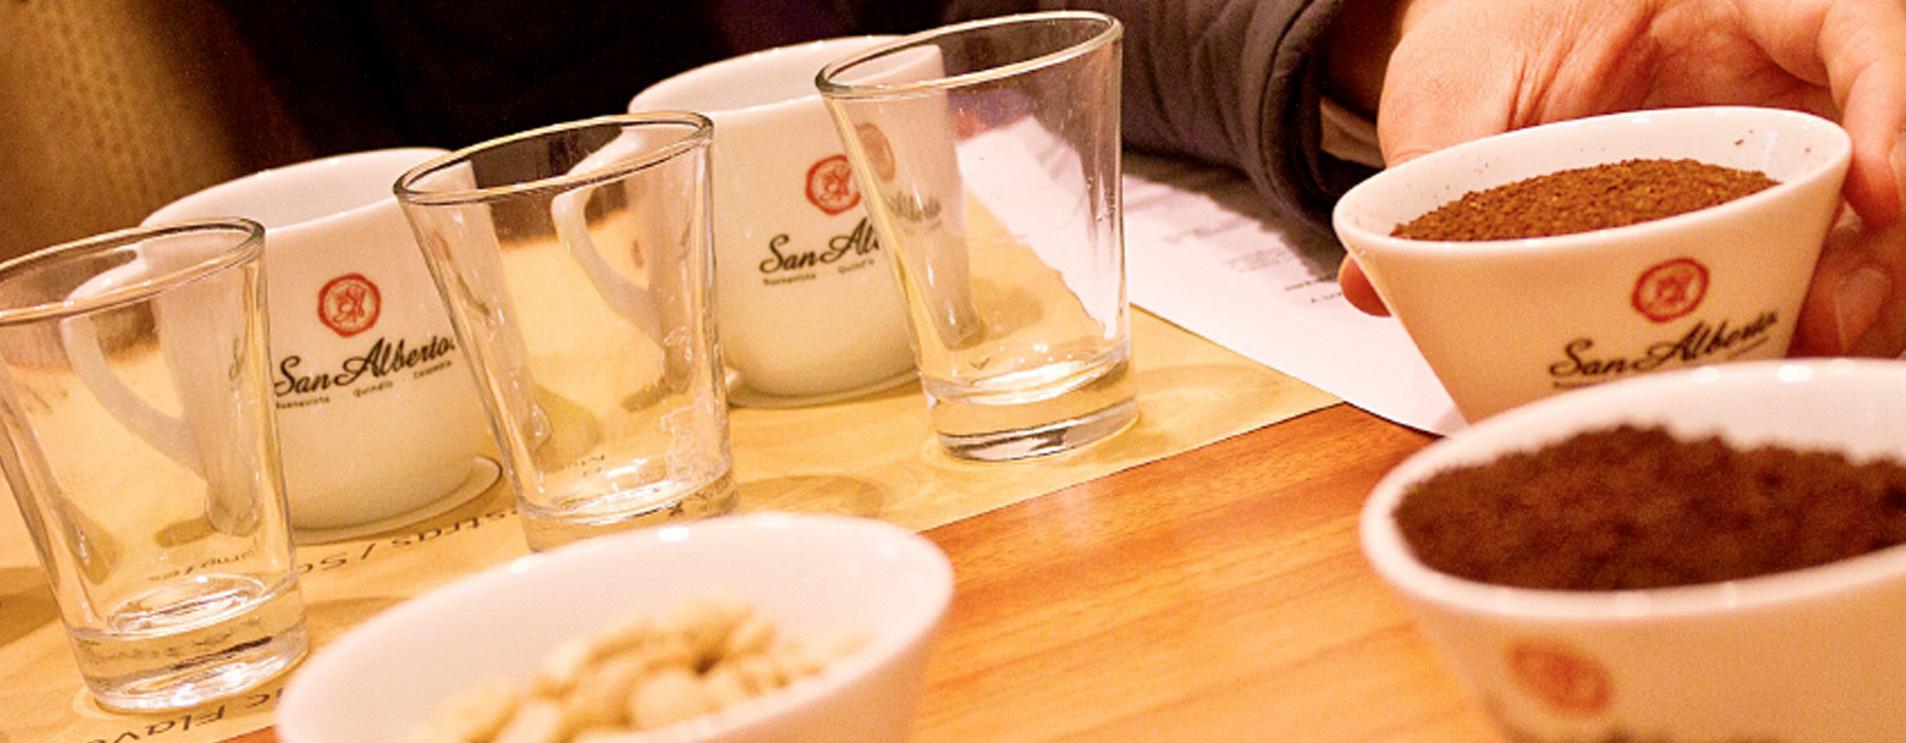 CARTAGENA-COFFEE_SAN_ALBERTO